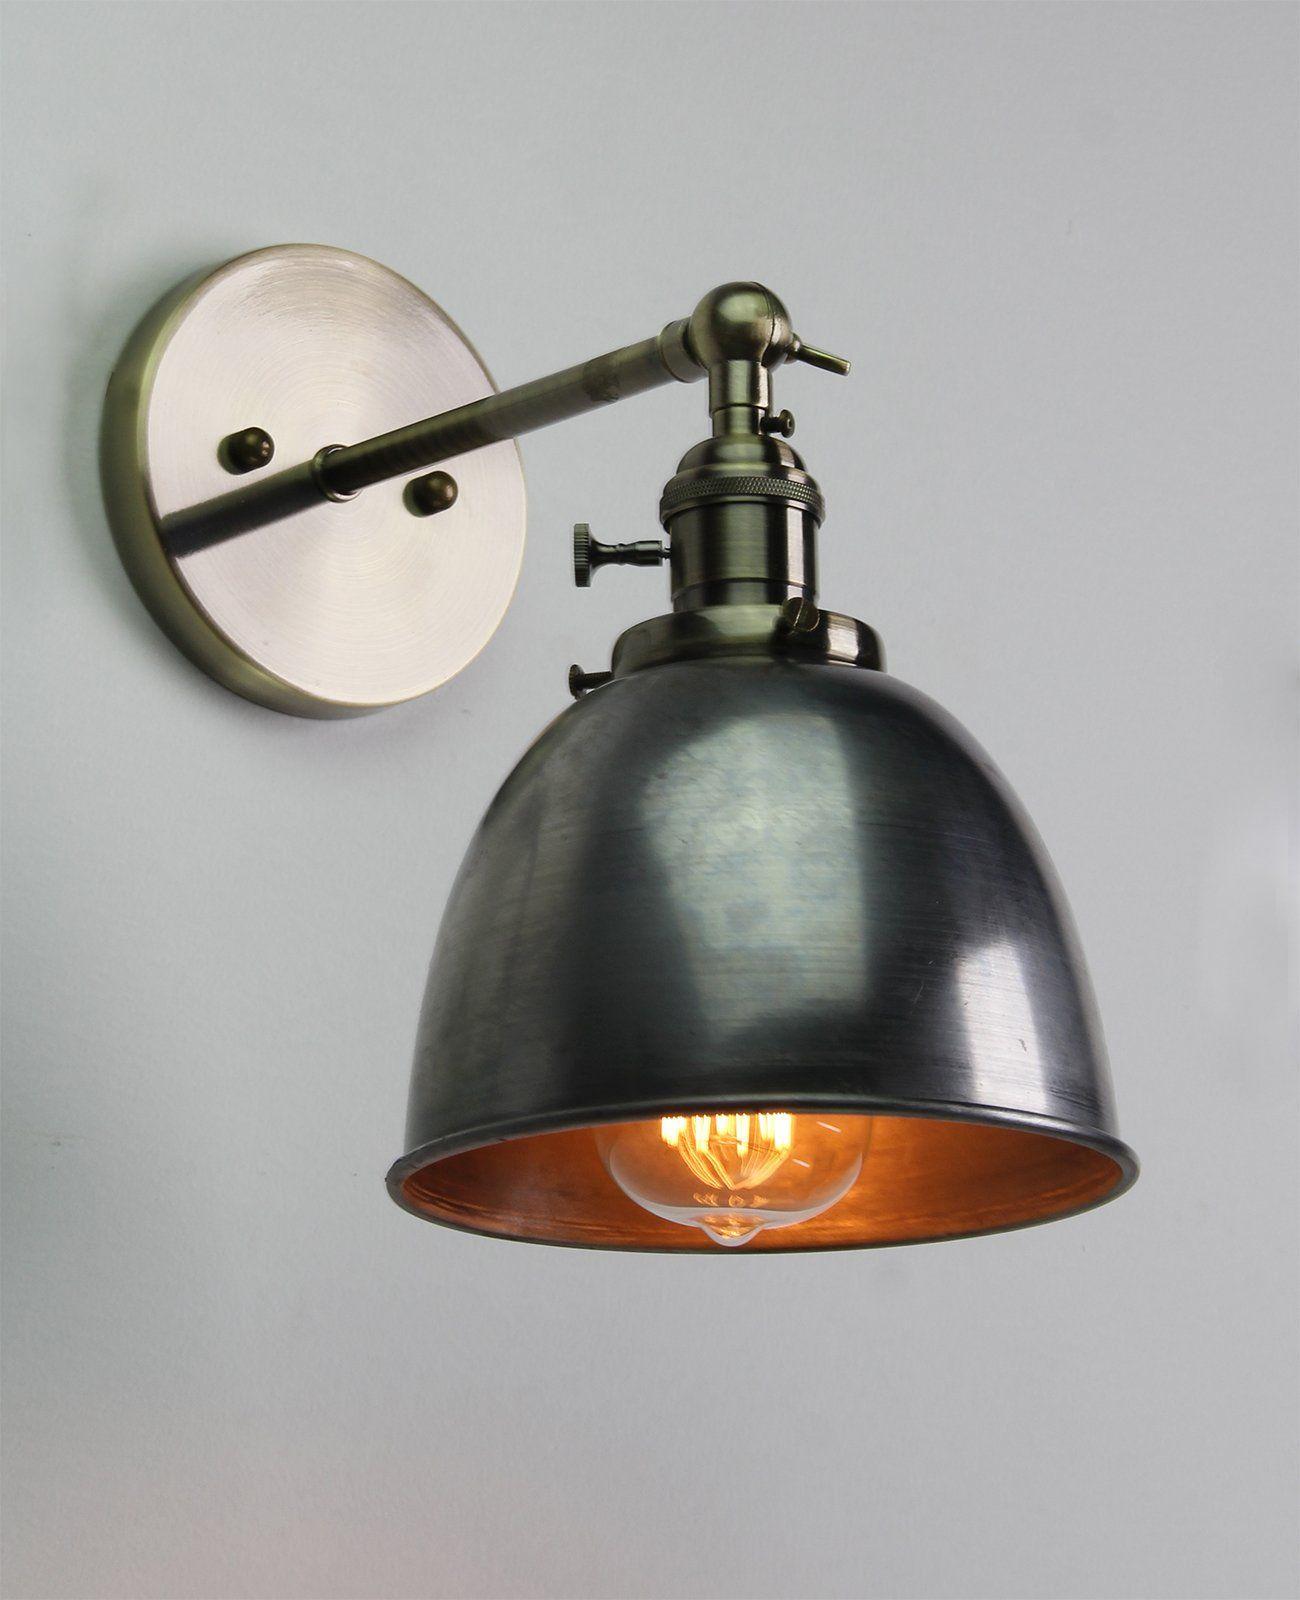 Kitchen Wall Lights Art Prints Buyee Modern Vintage Industrial Metal Shade Loft Coffee Bar Scone Lamp Light Gold Amazon Co Uk Lighting